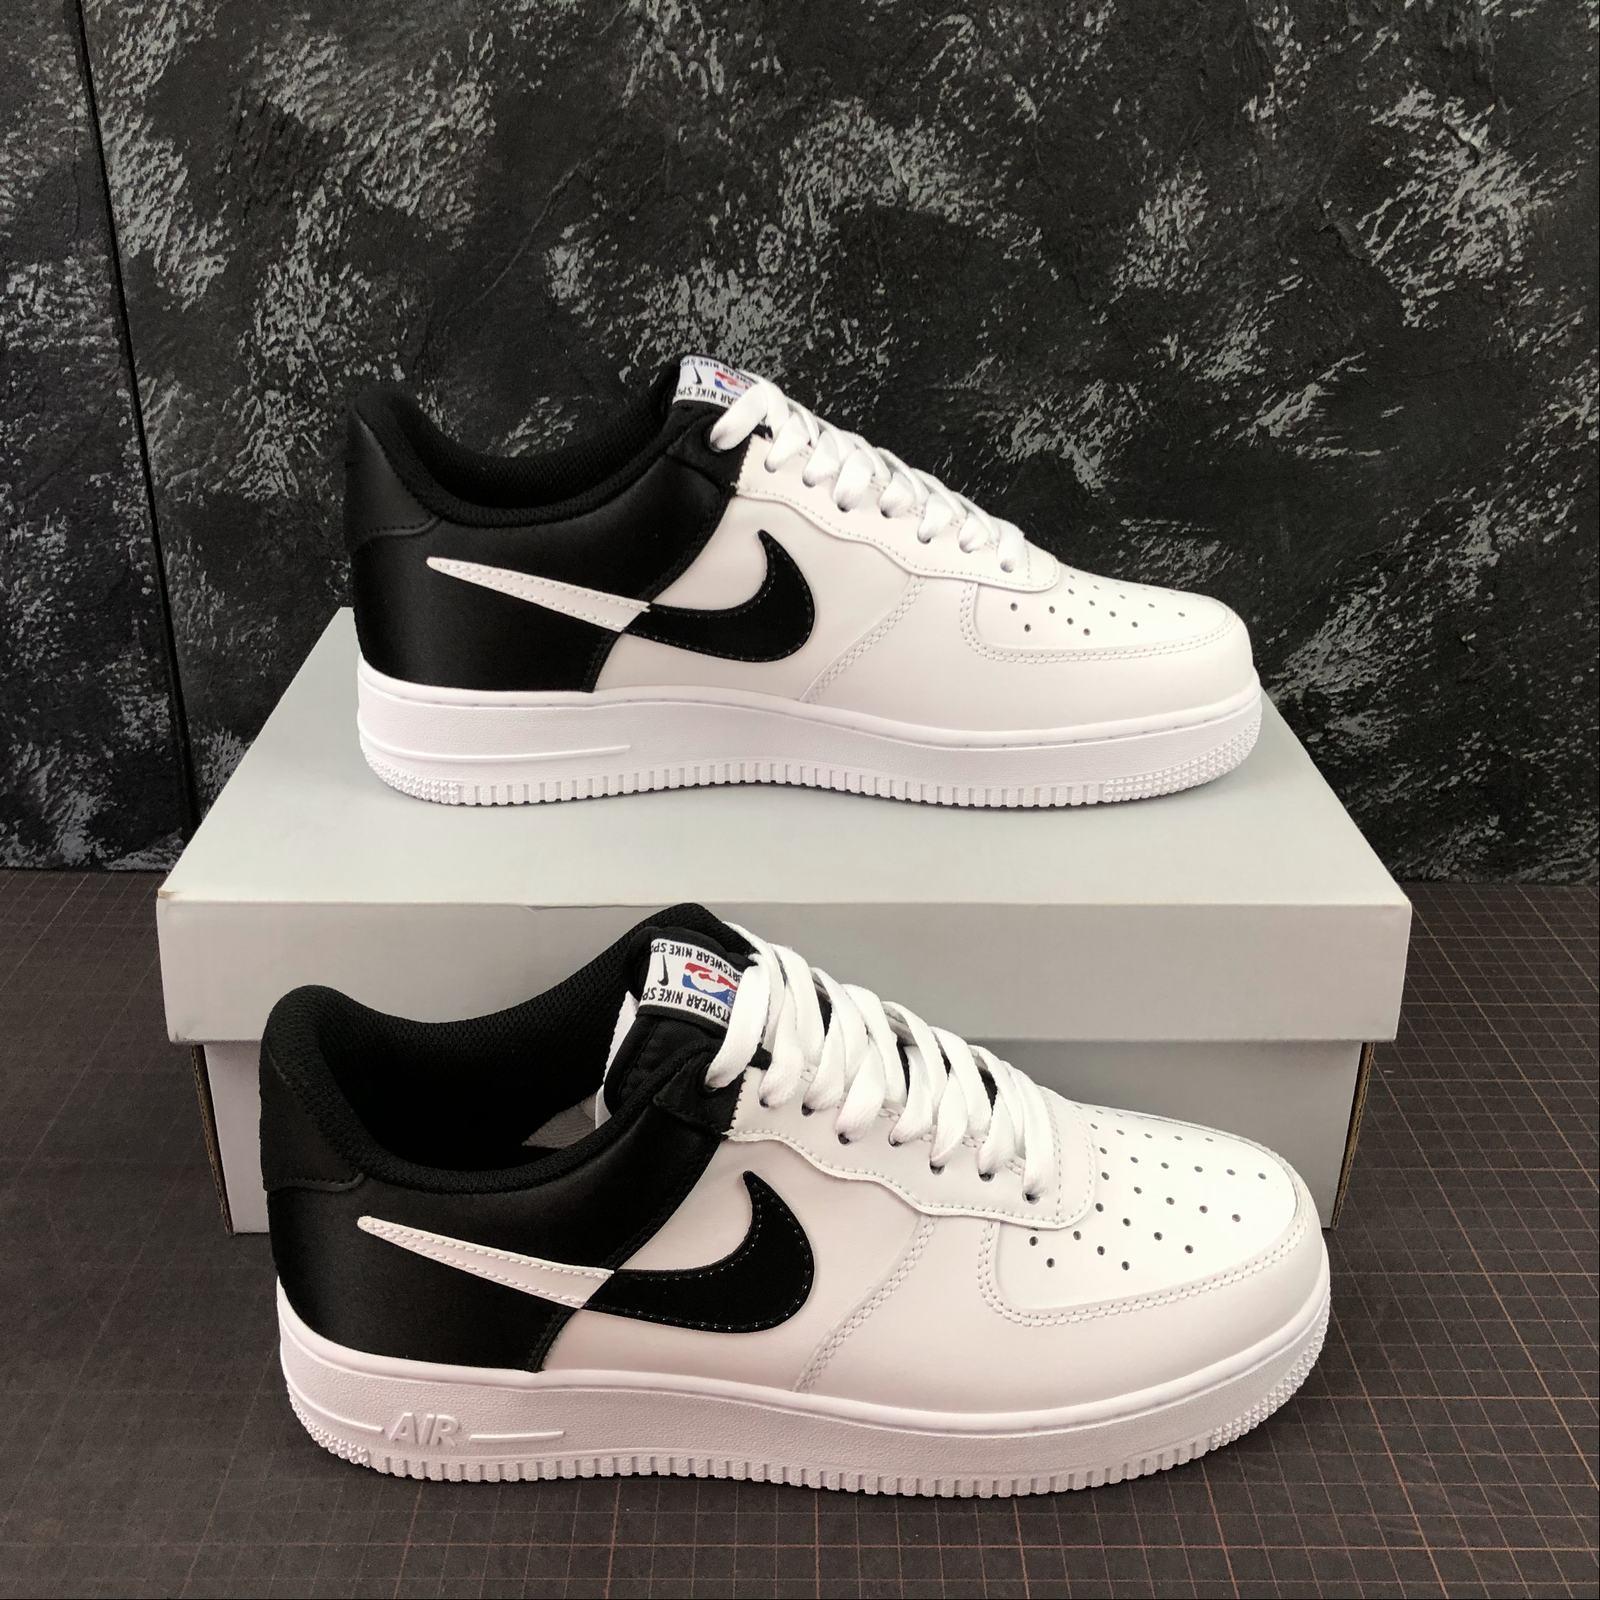 giay-sneaker-nike-air-force-1-07-bq4420-100-da-white-black